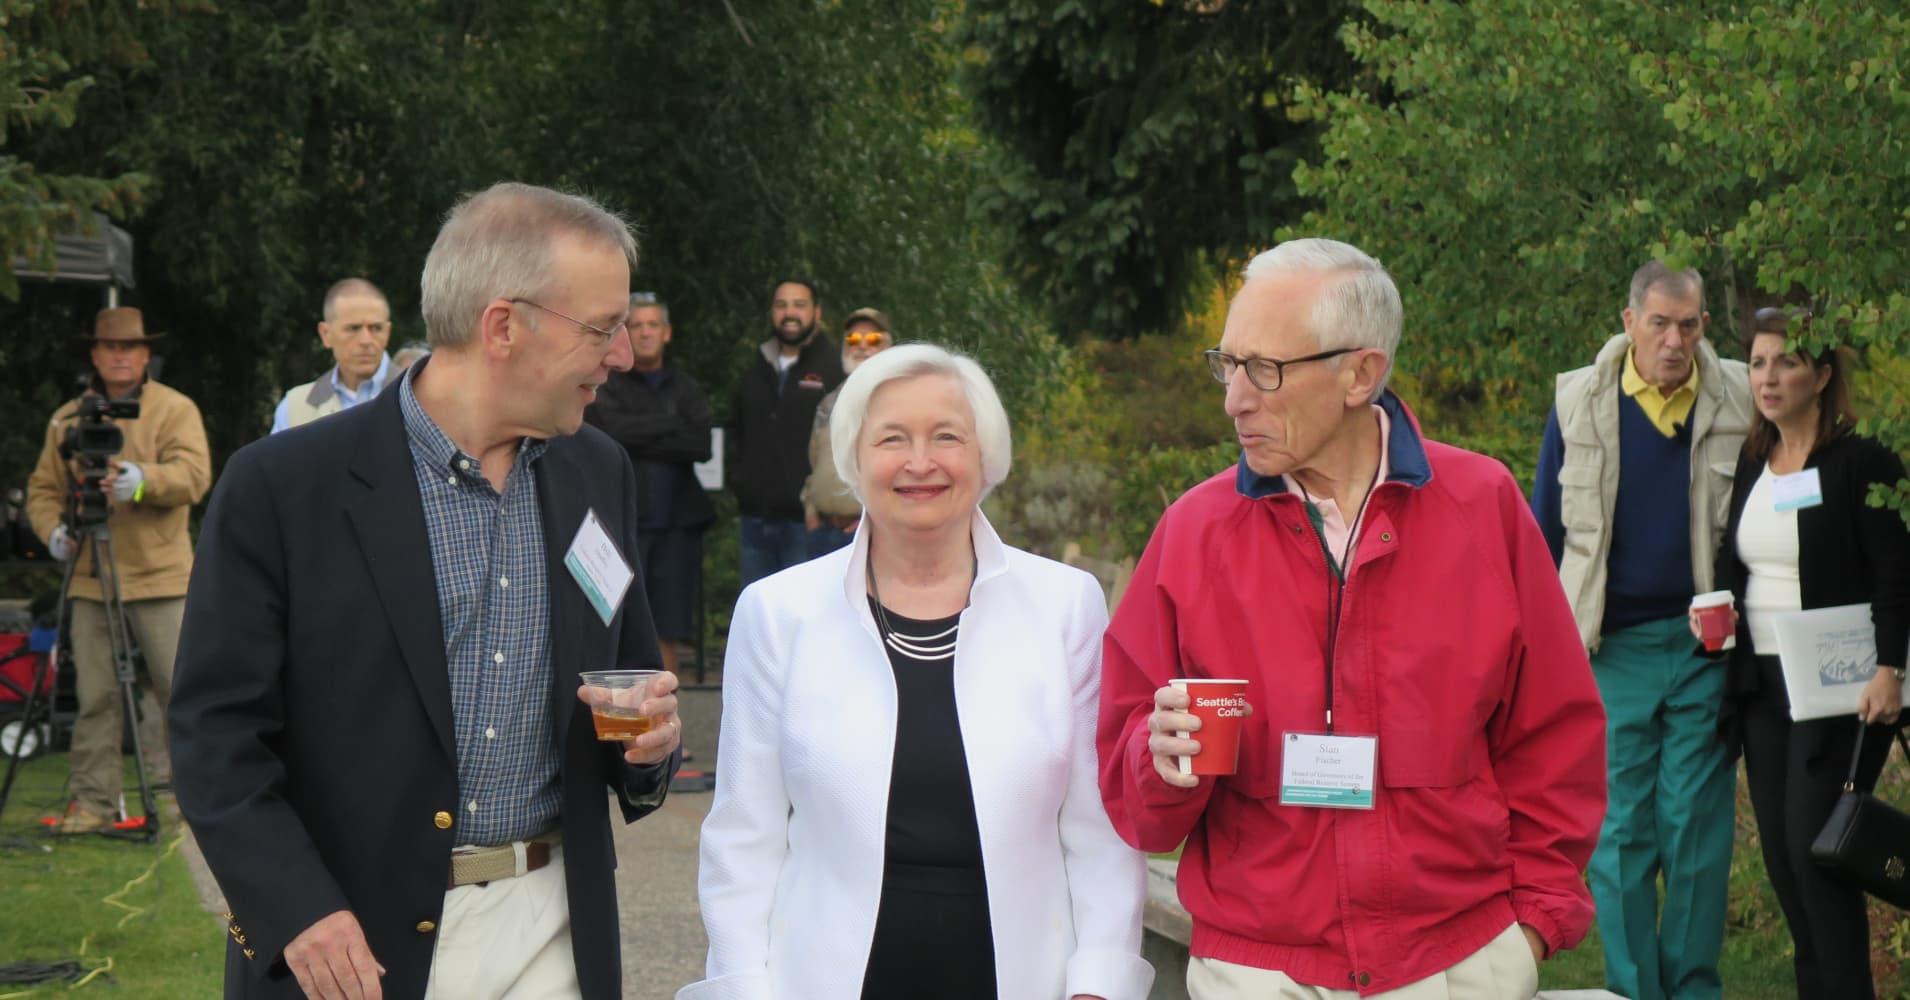 William C. Dudley, Janet Yellen and Stanley Fischer in Jackson Hole